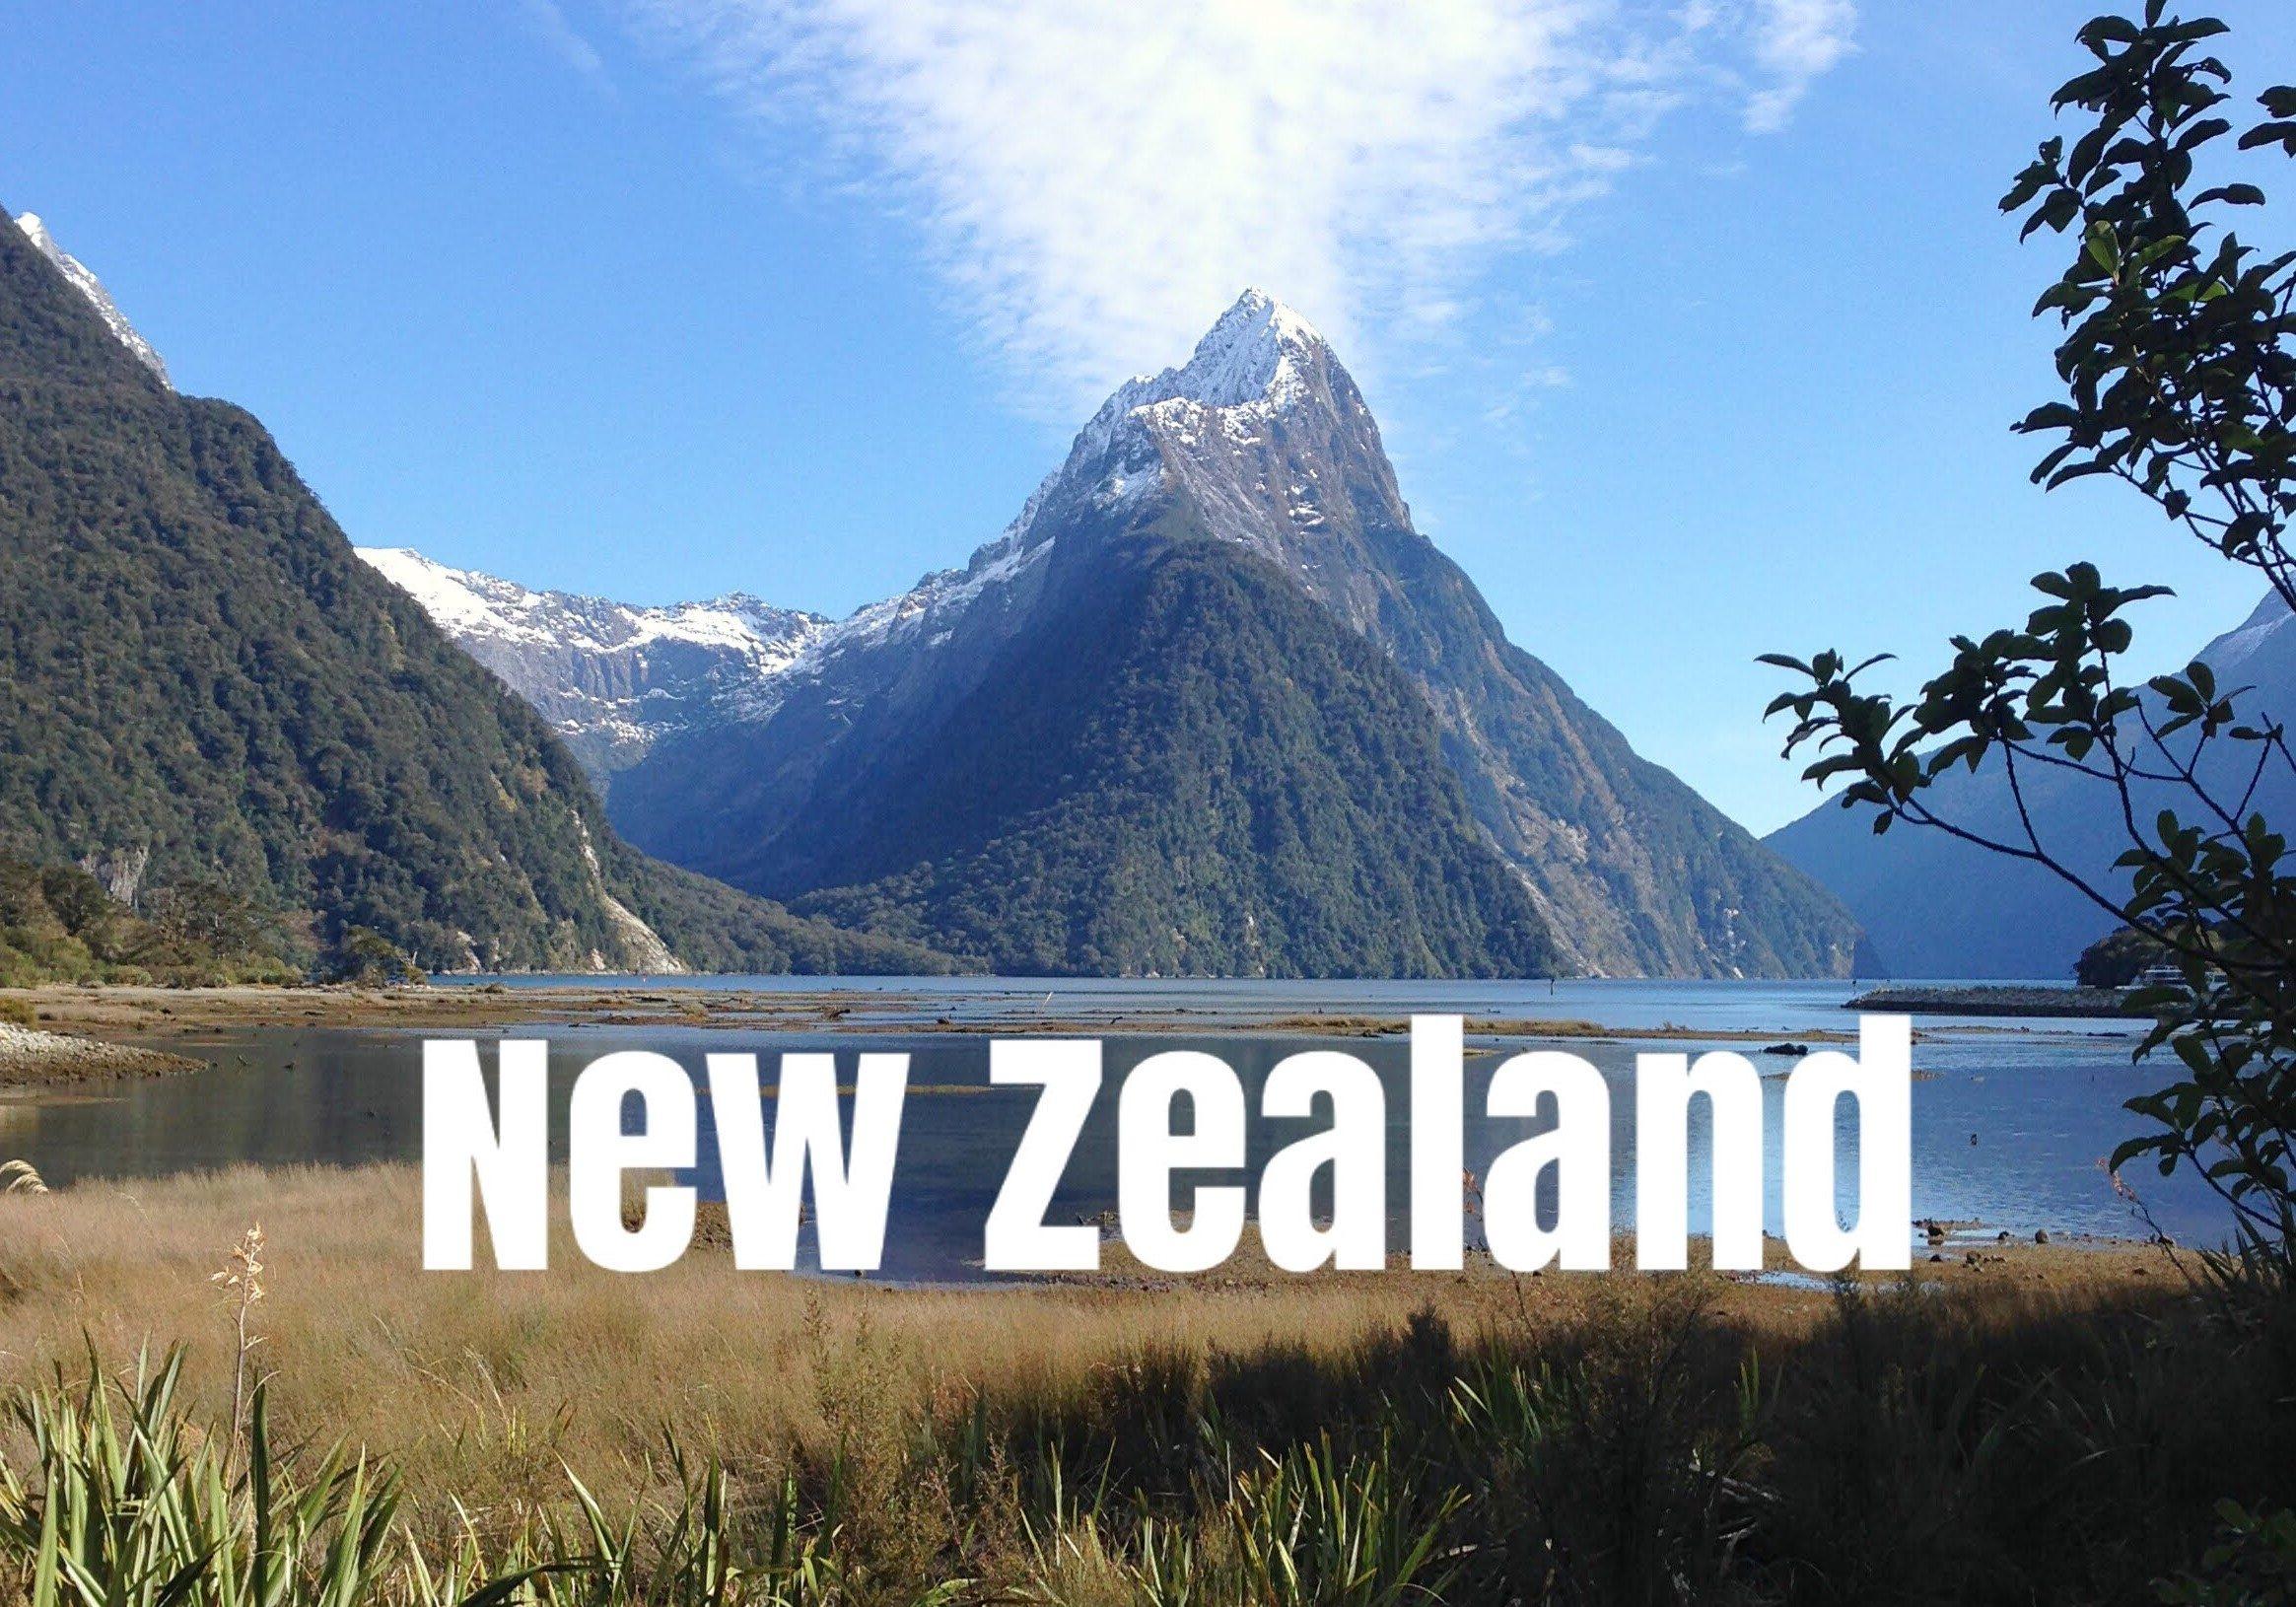 New Zealand, wanderdaze, blog, travelling, travel blog,